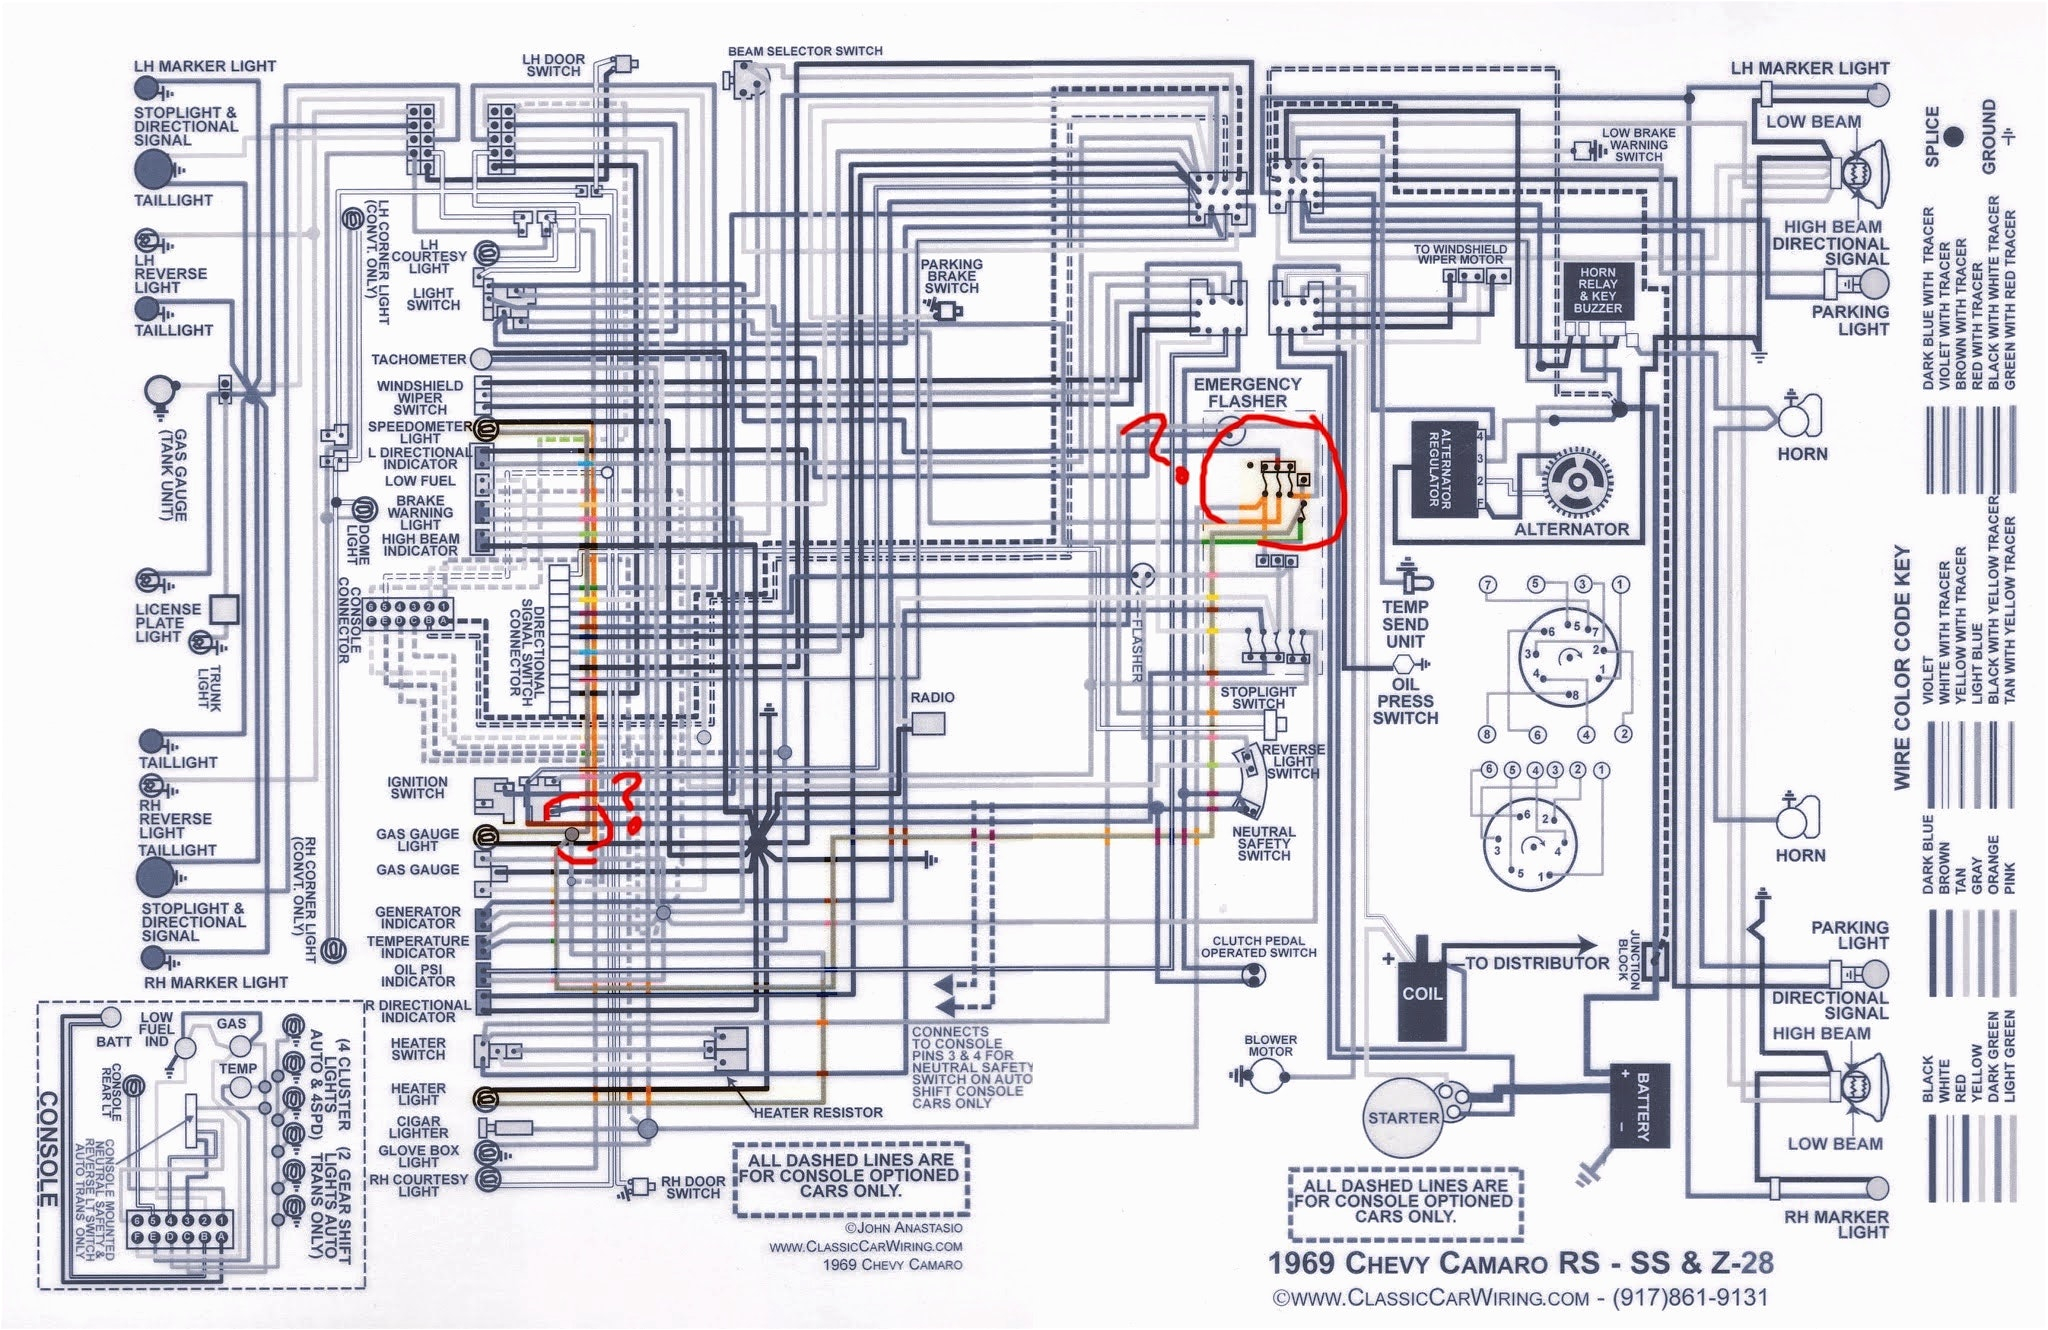 wrg 5531 67 impala convertible wiring diagram wiring diagram 1967 headlight vacuum diagram cadillac 1968 pontiac